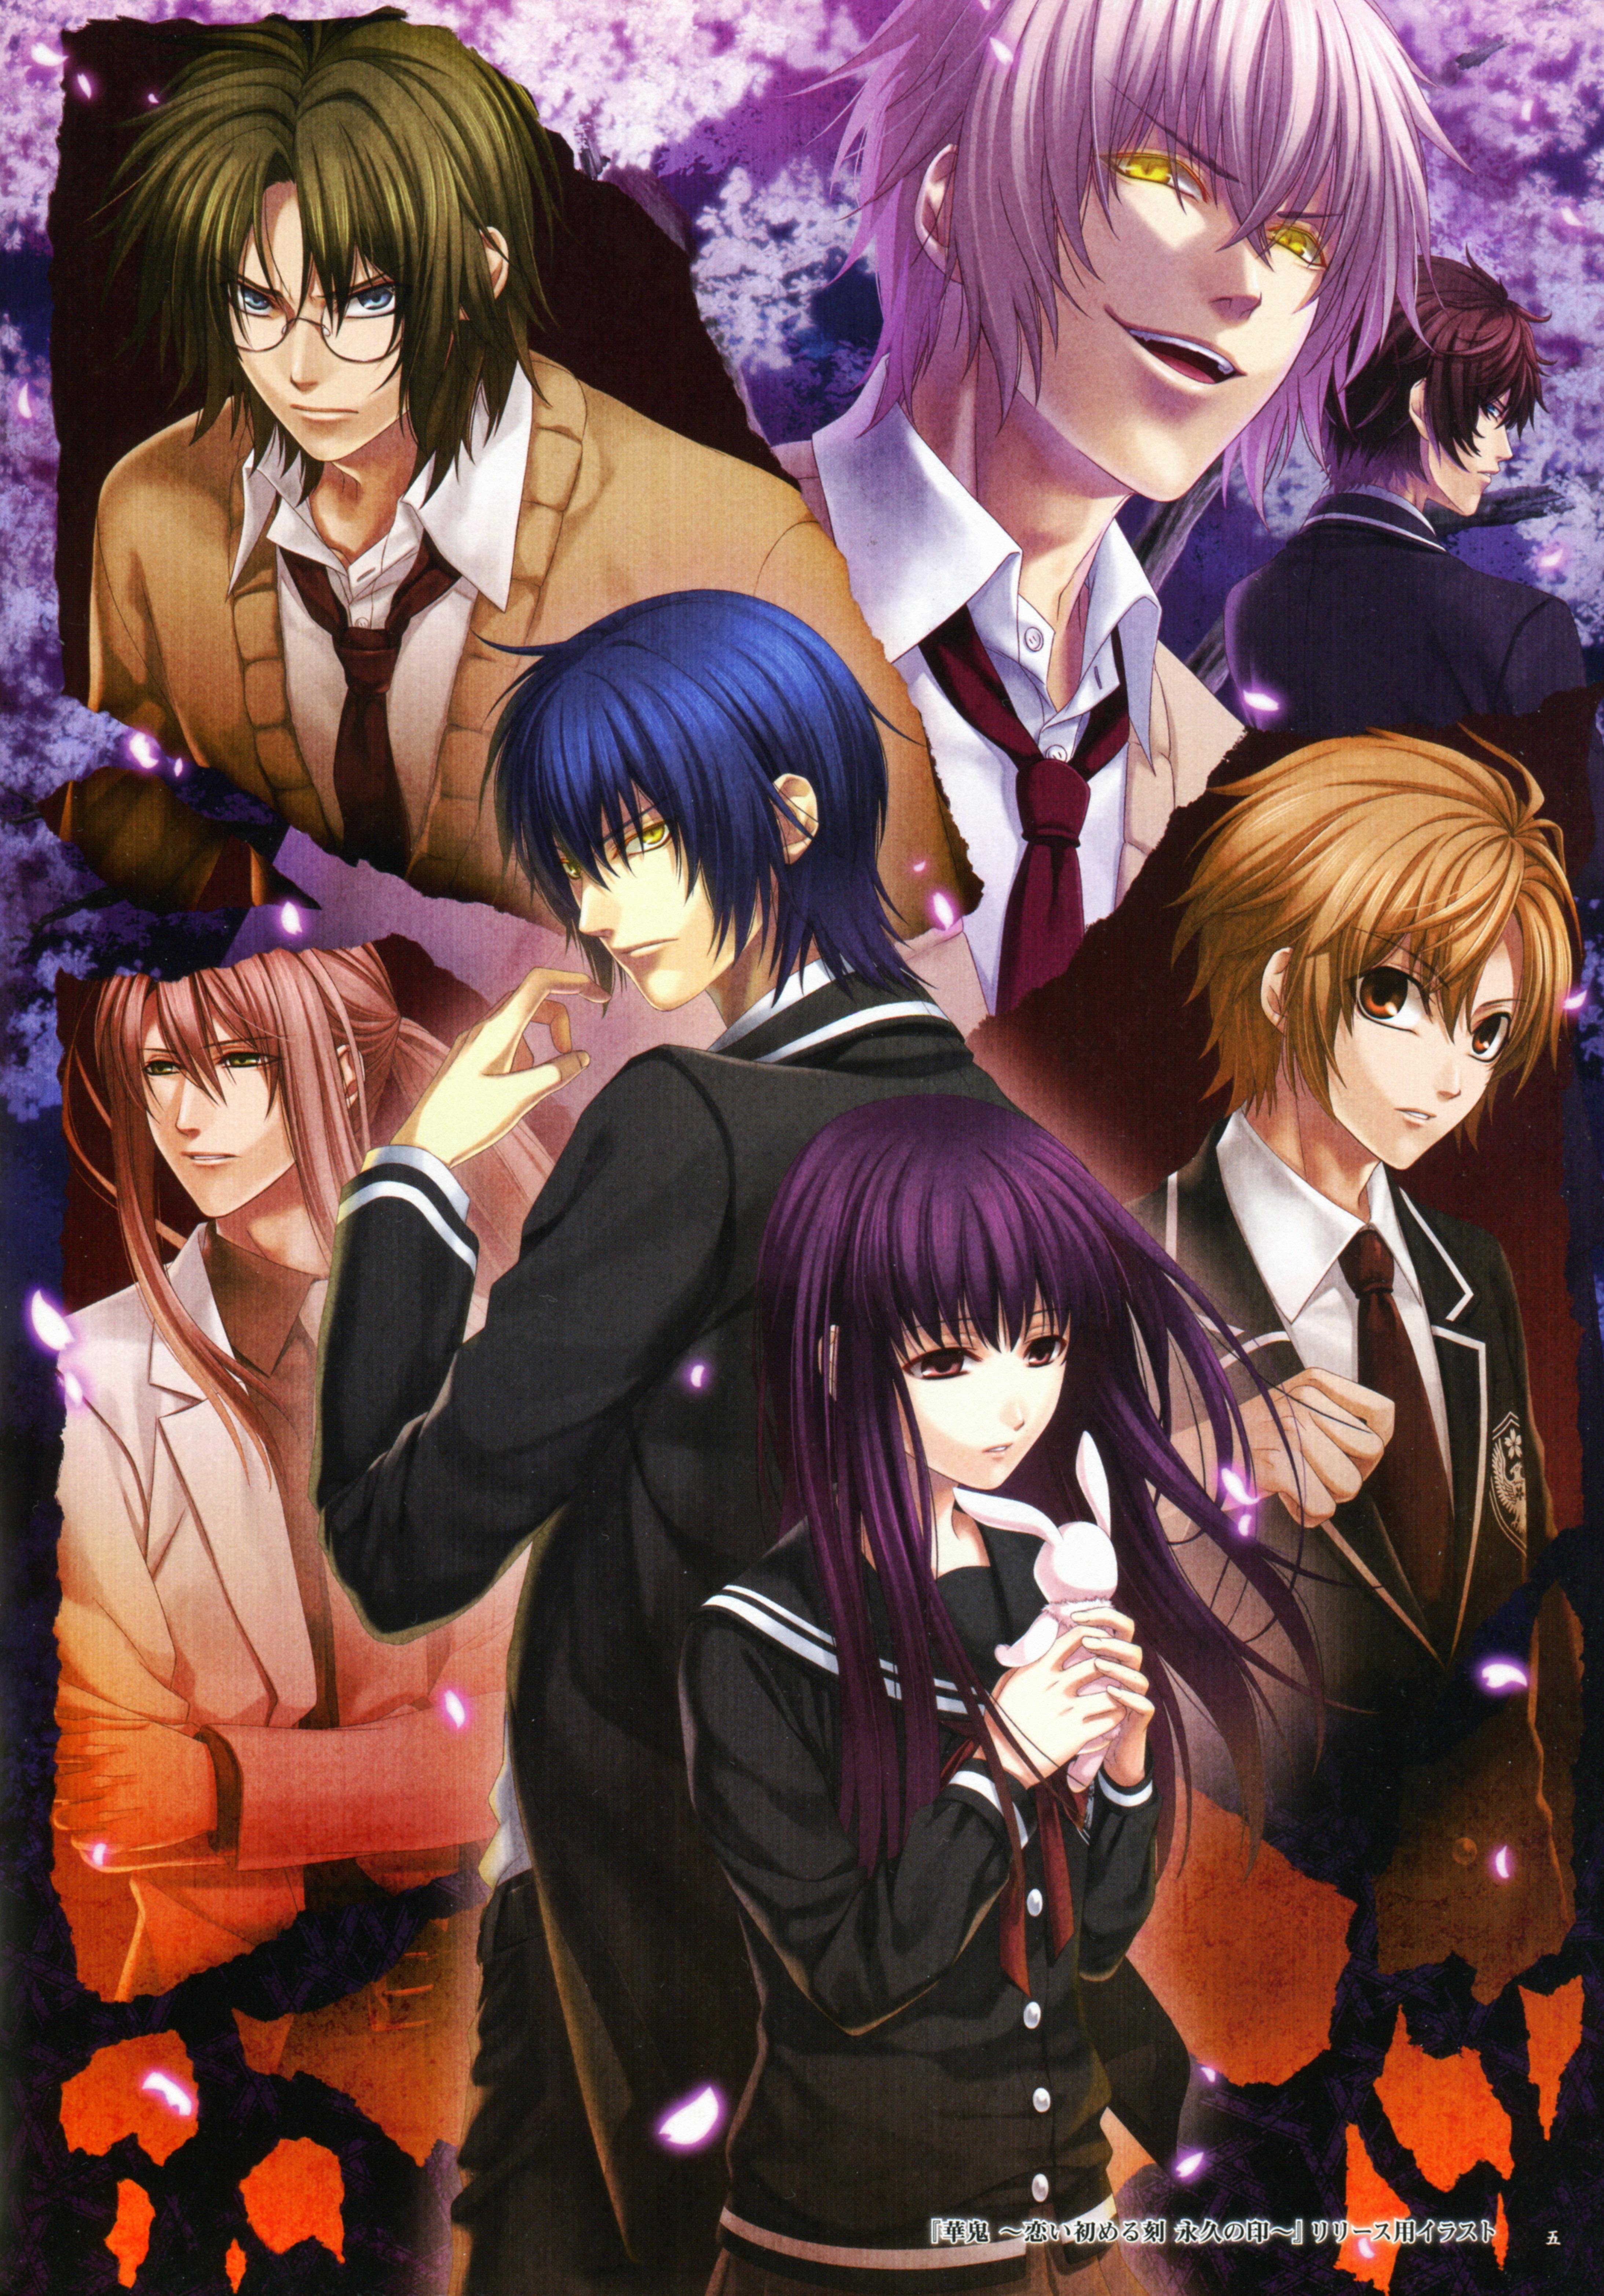 HD Quality Wallpaper   Collection: Anime, 4373x6261 Hanaoni